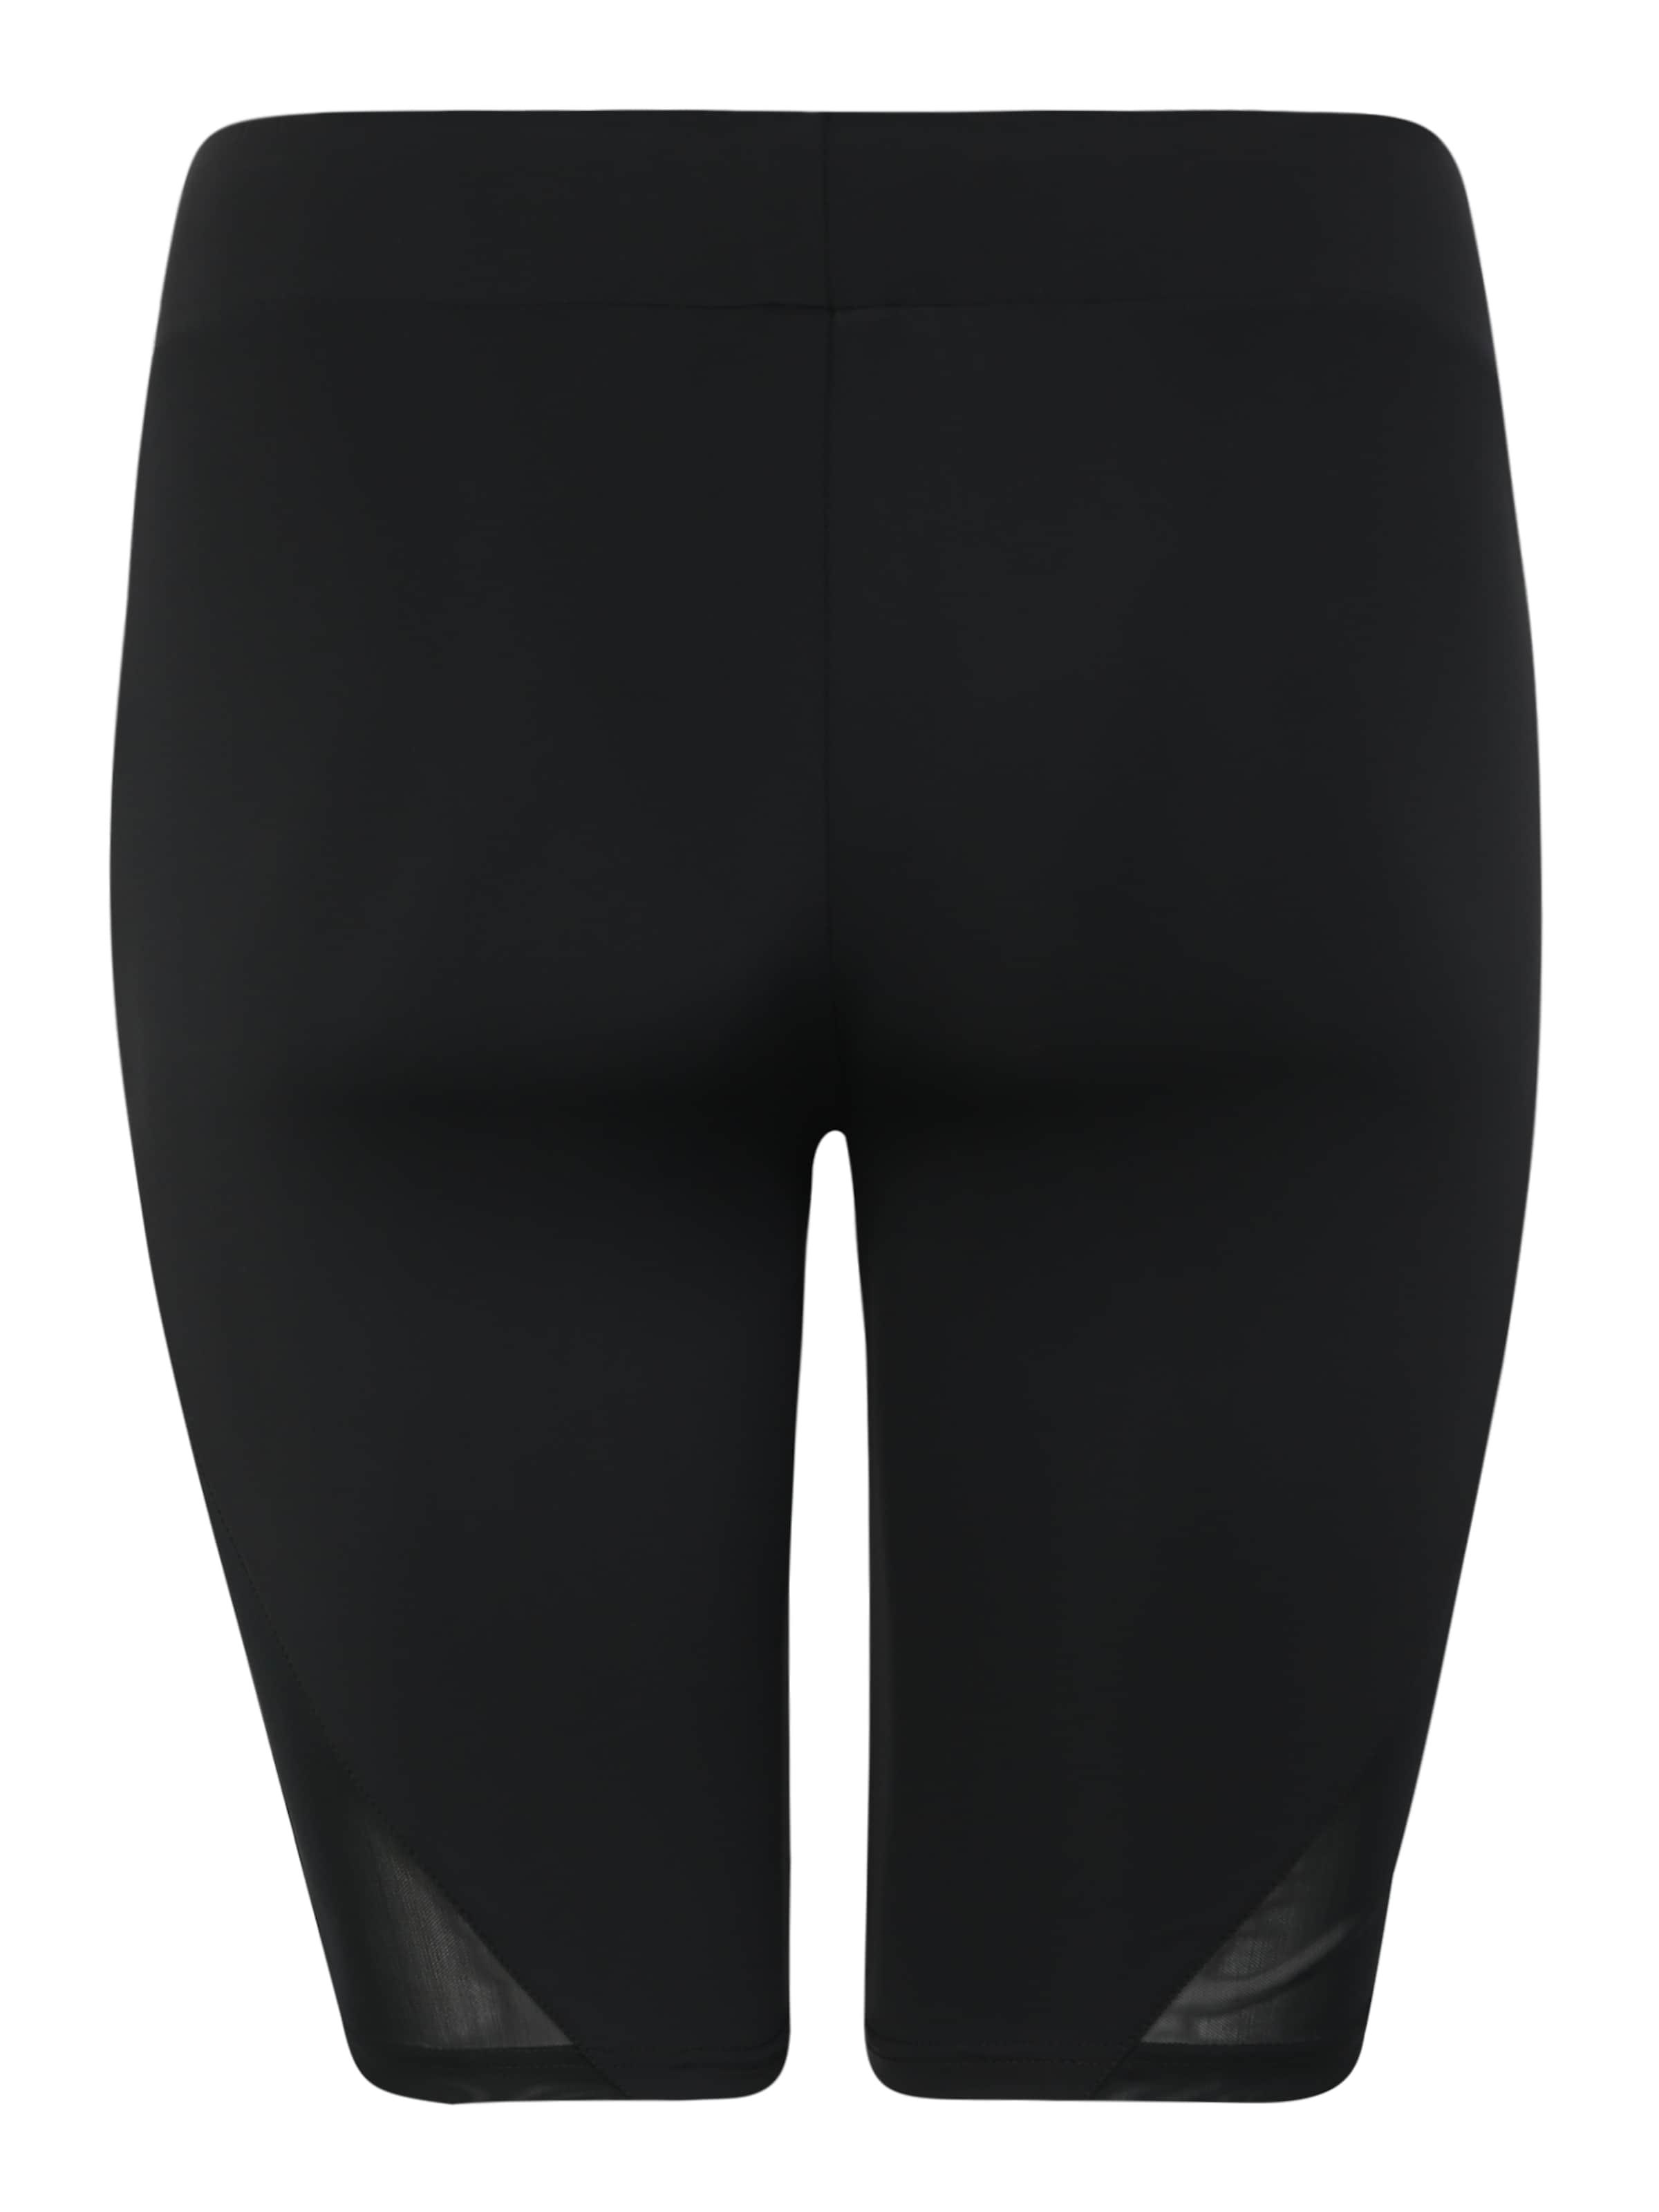 Urban Tech 'ladies Shorts' Classics Noir Cycle Curvy Pantalon En Mesh QdhrsCBtx